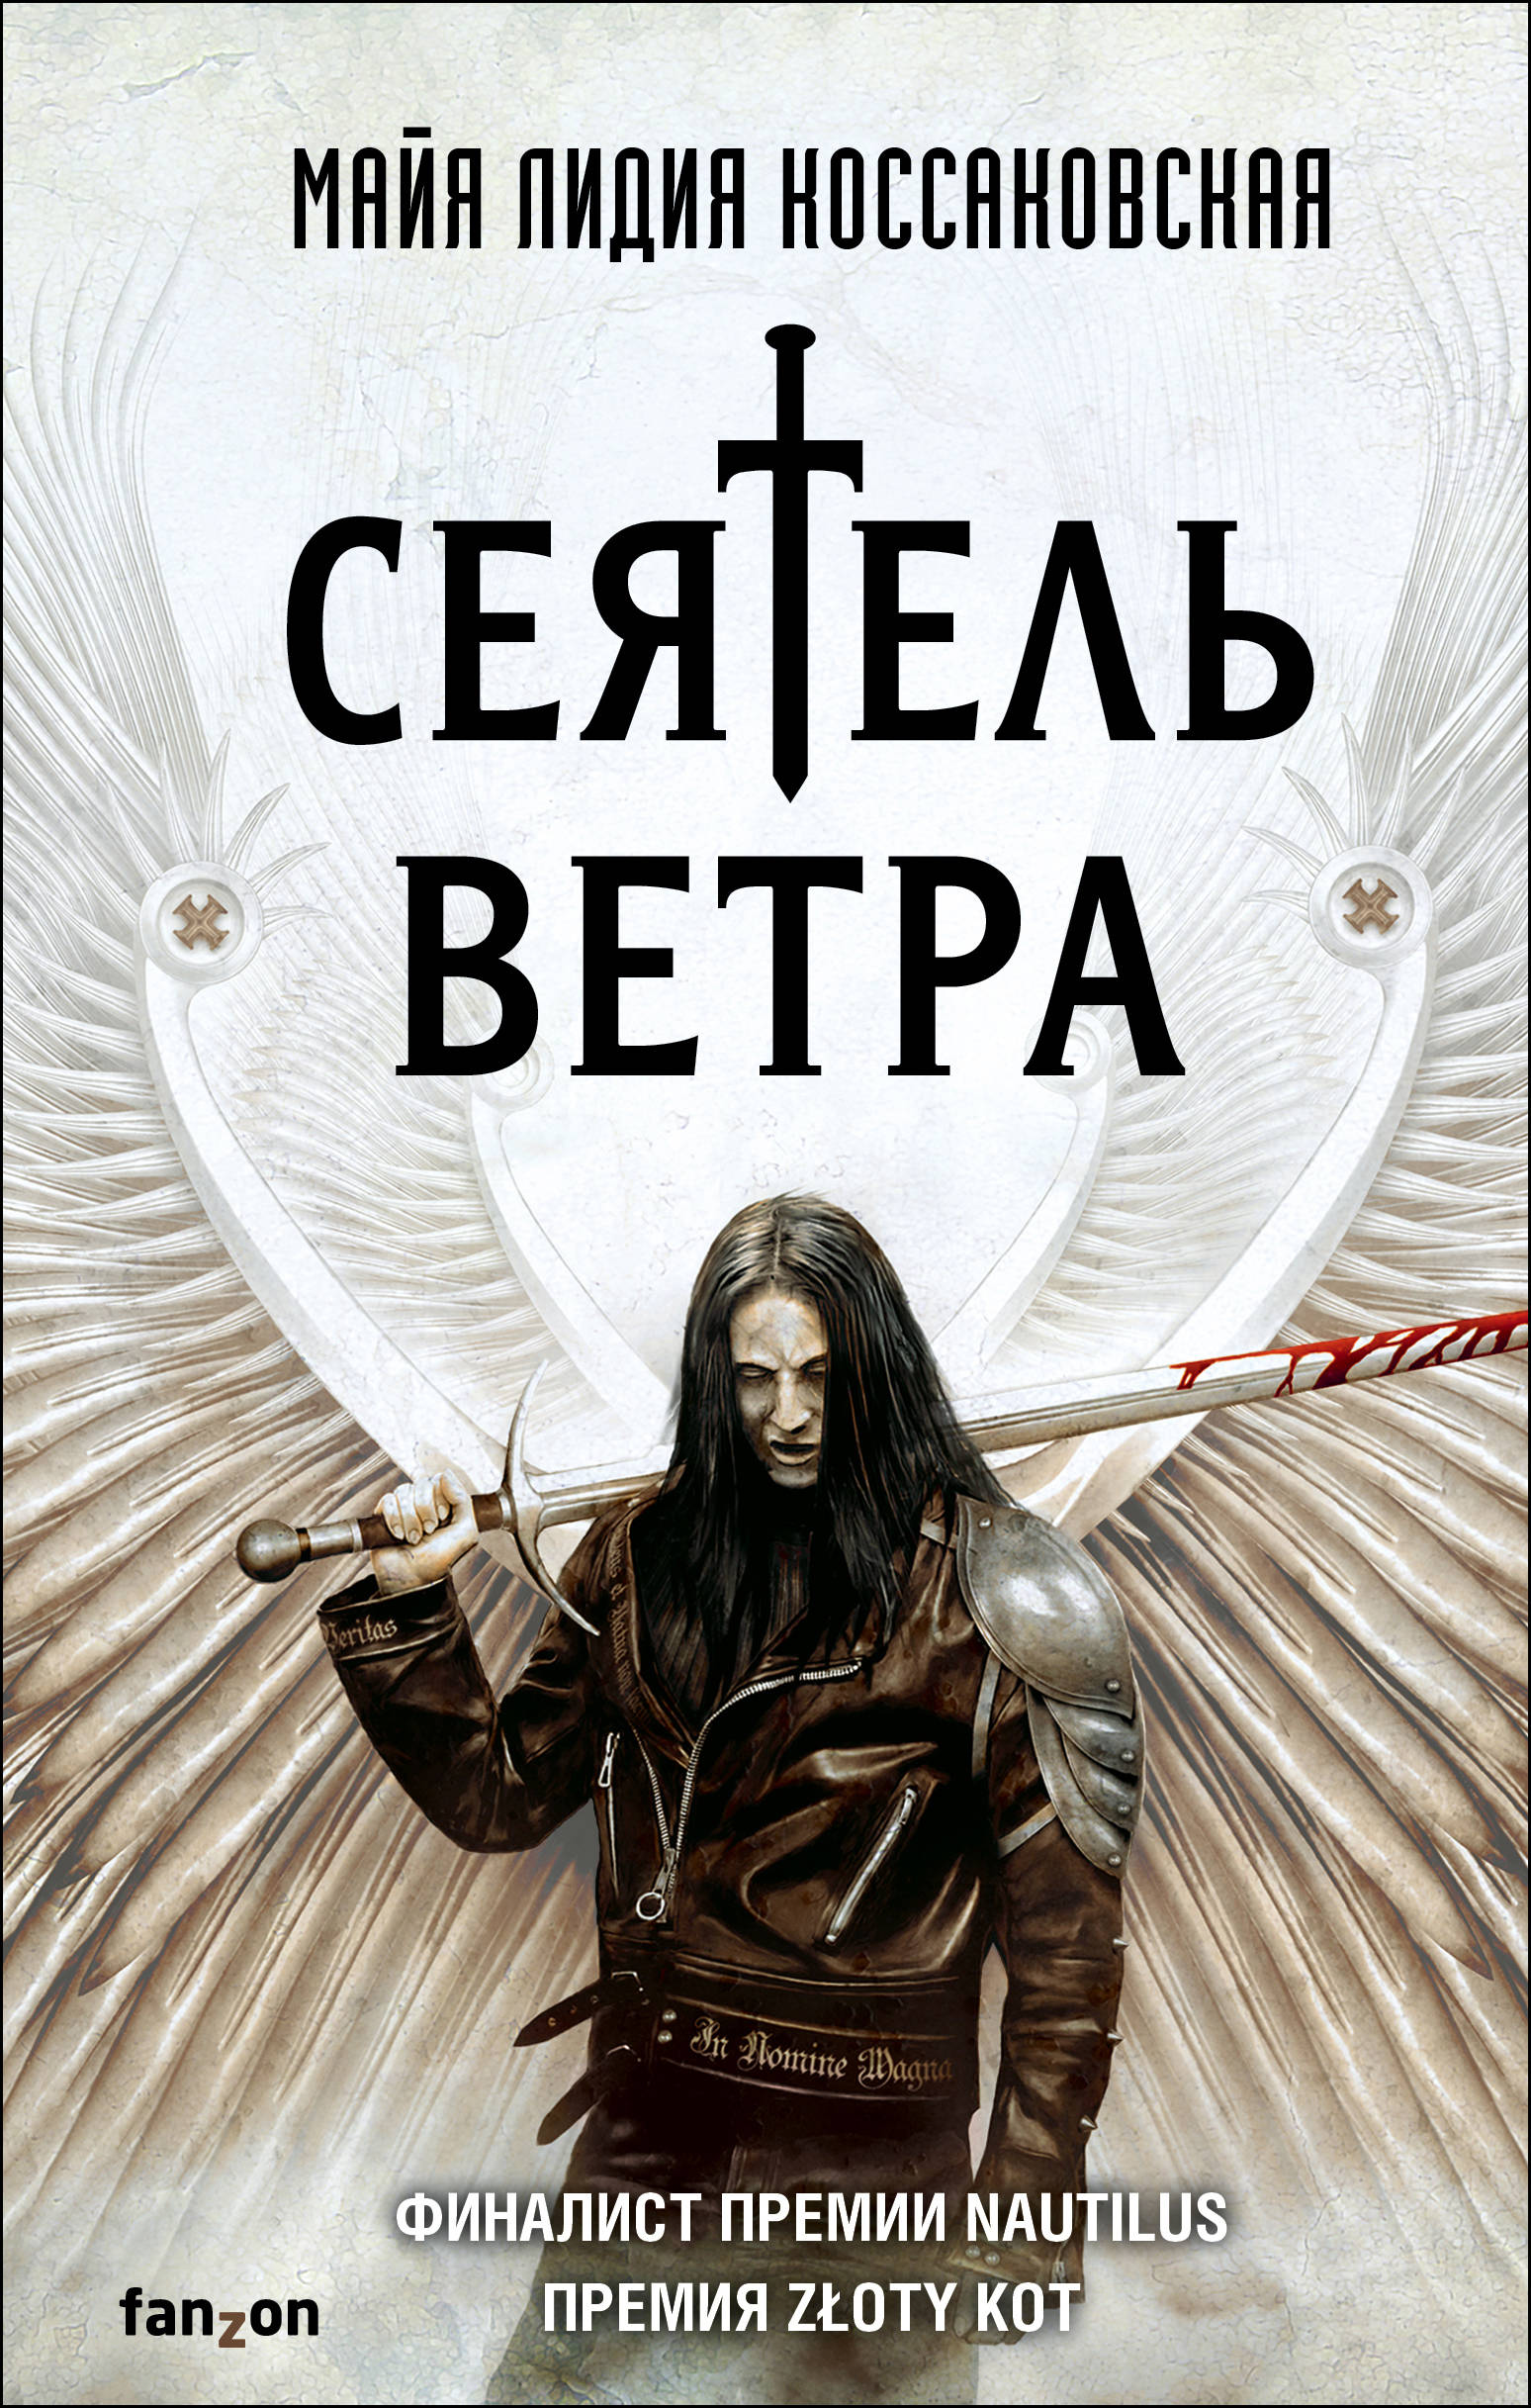 Sejatel Vetra